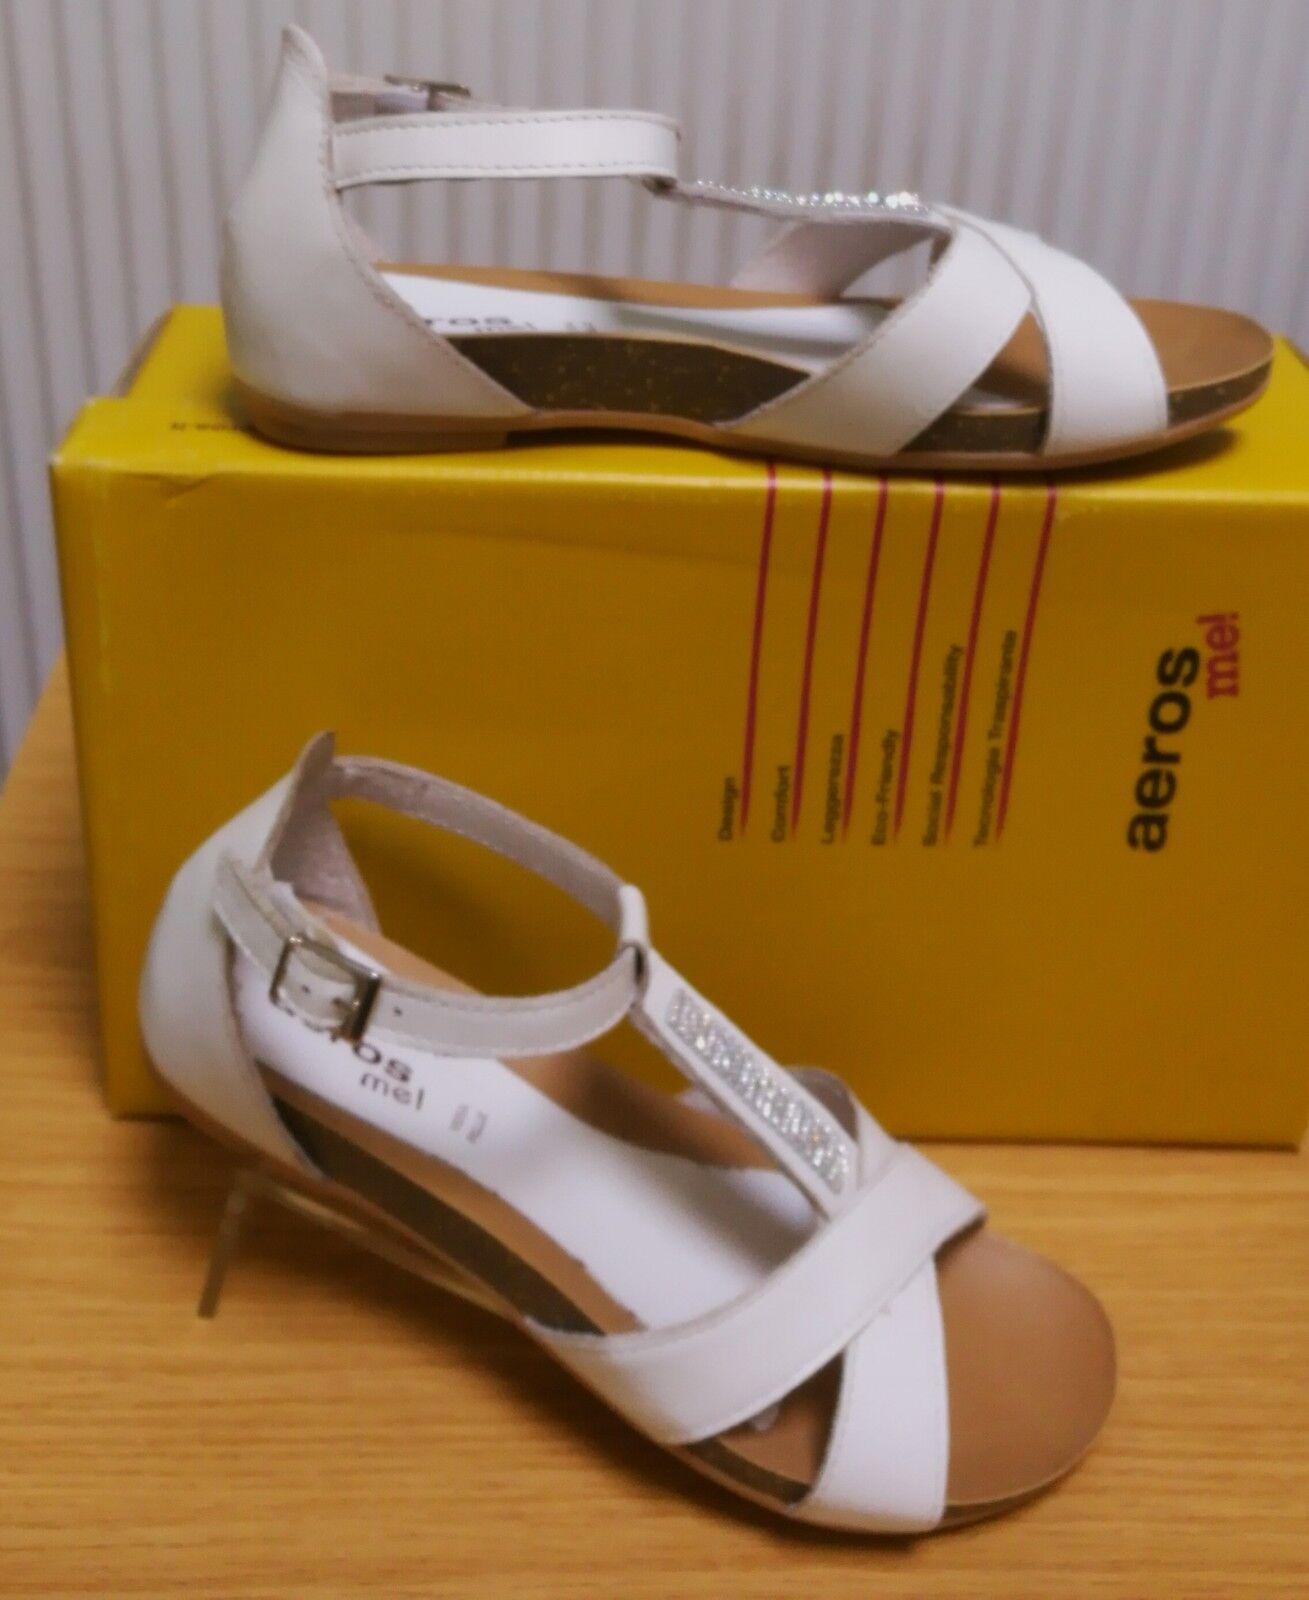 Damen-Sandale, weiß, weiß, Damen-Sandale, NEU, Größen 36, 38 aa3bcf